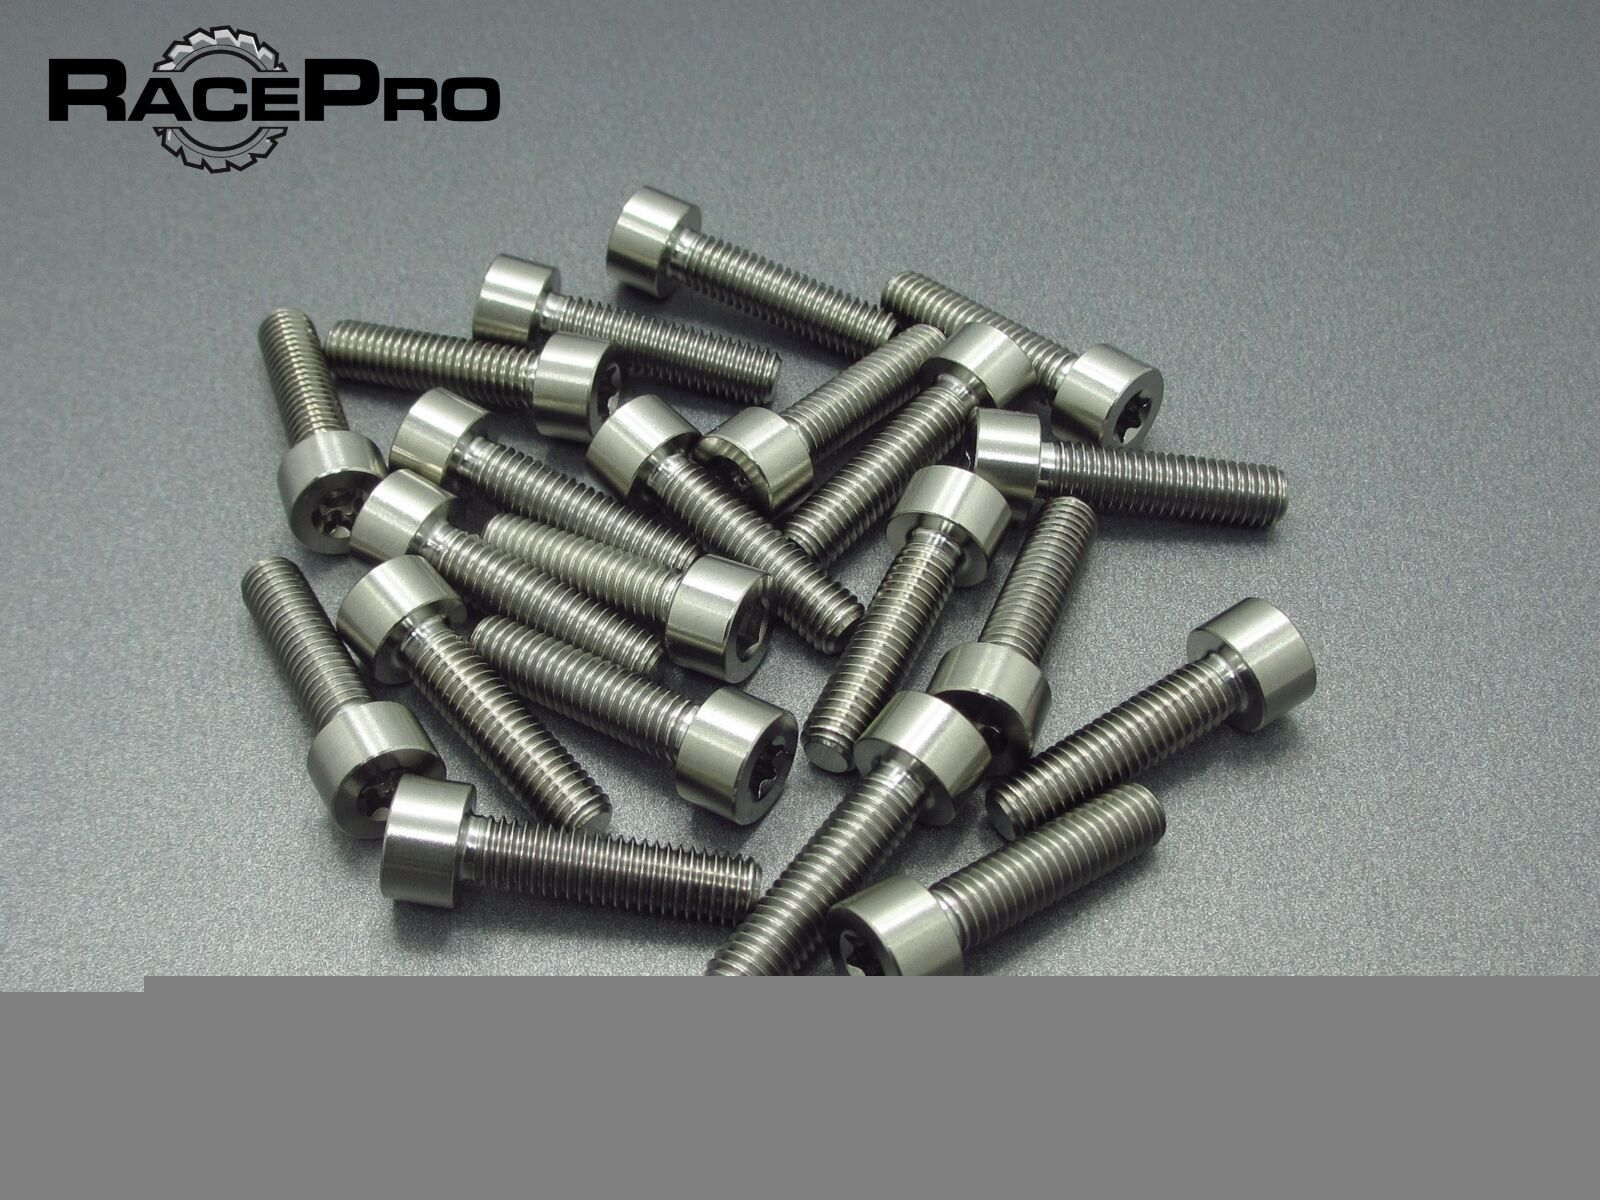 RACEPRO - 6x Tornillo de cabeza Allen PARALELO torx - M7 X 20mm 1mm - Natural